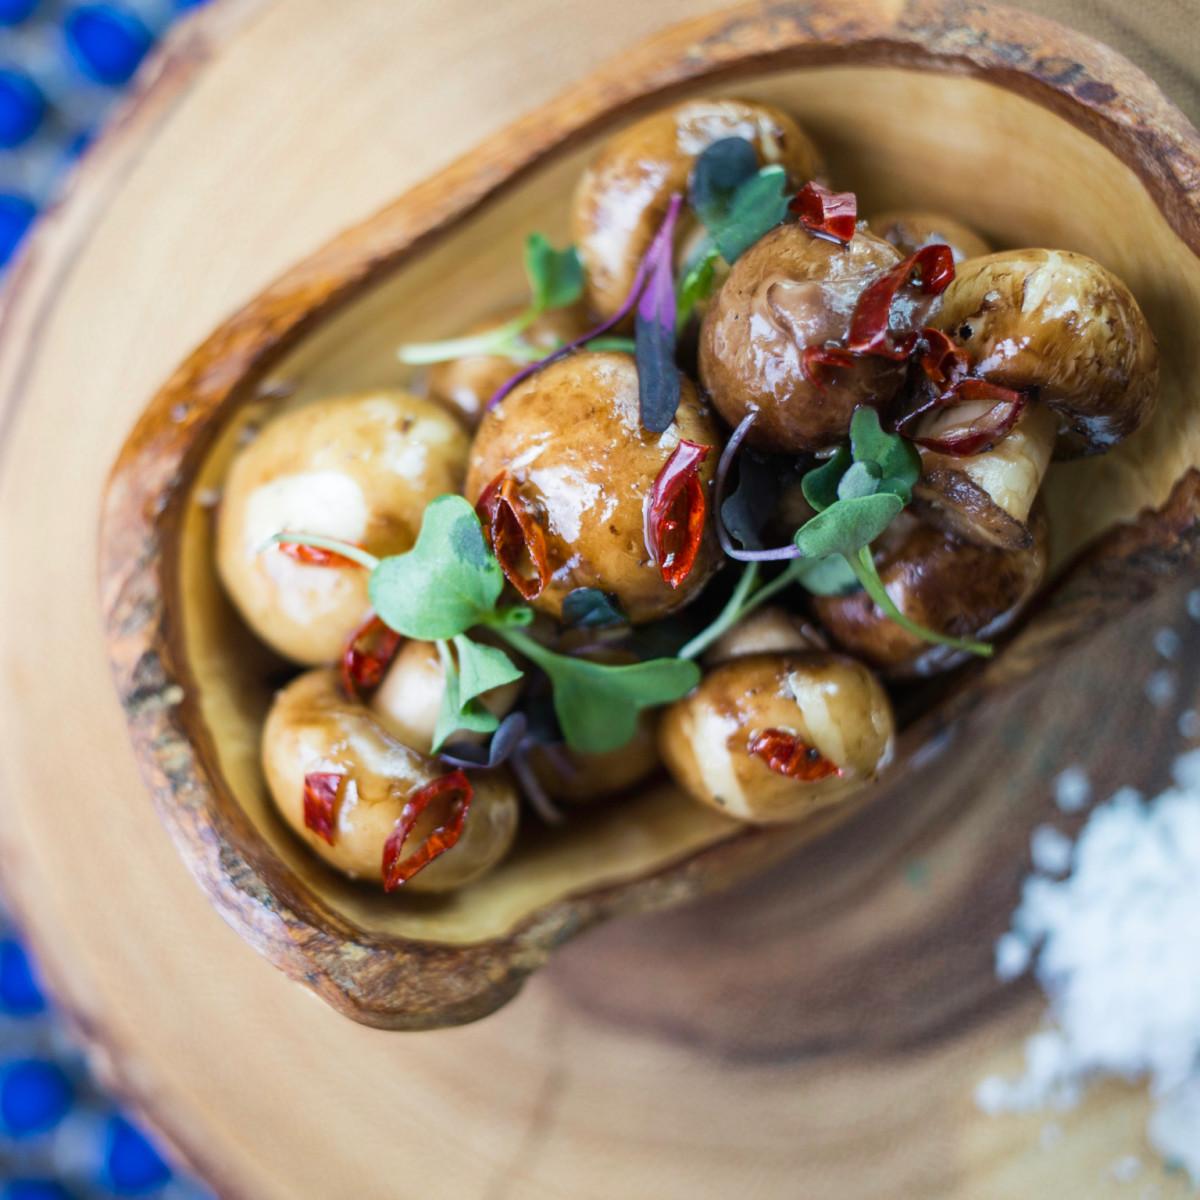 A'Bouzy truffled mushrooms